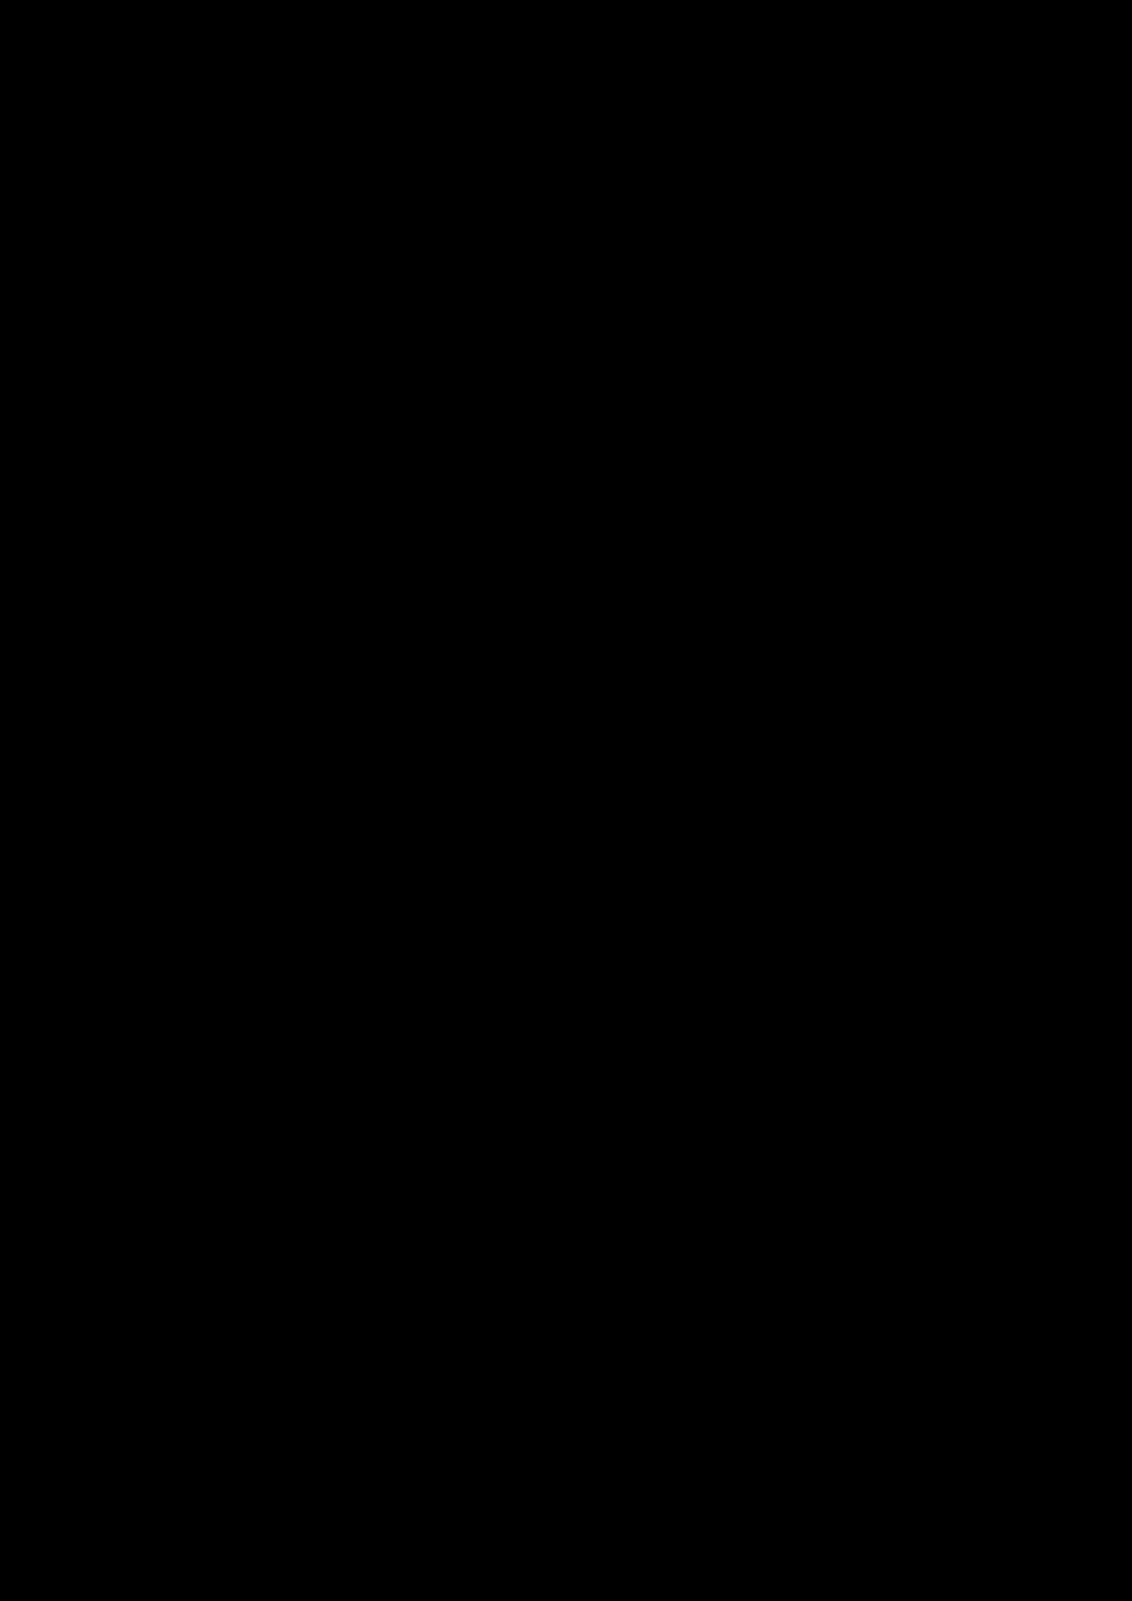 Belyiy sokol slide, Image 70